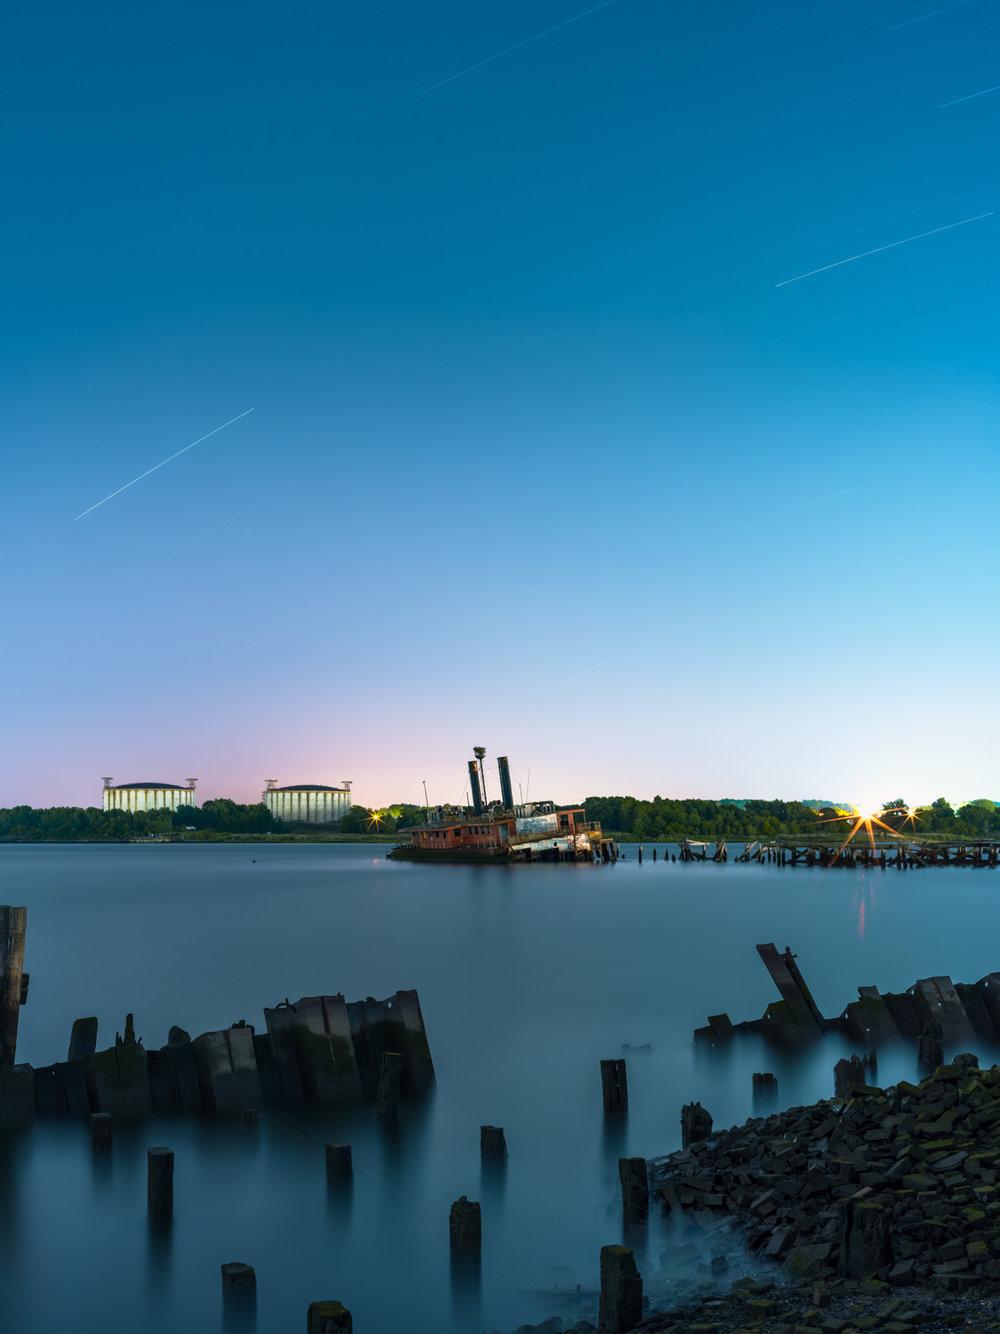 hassleblad_night_typoland_landscape-2.jpg